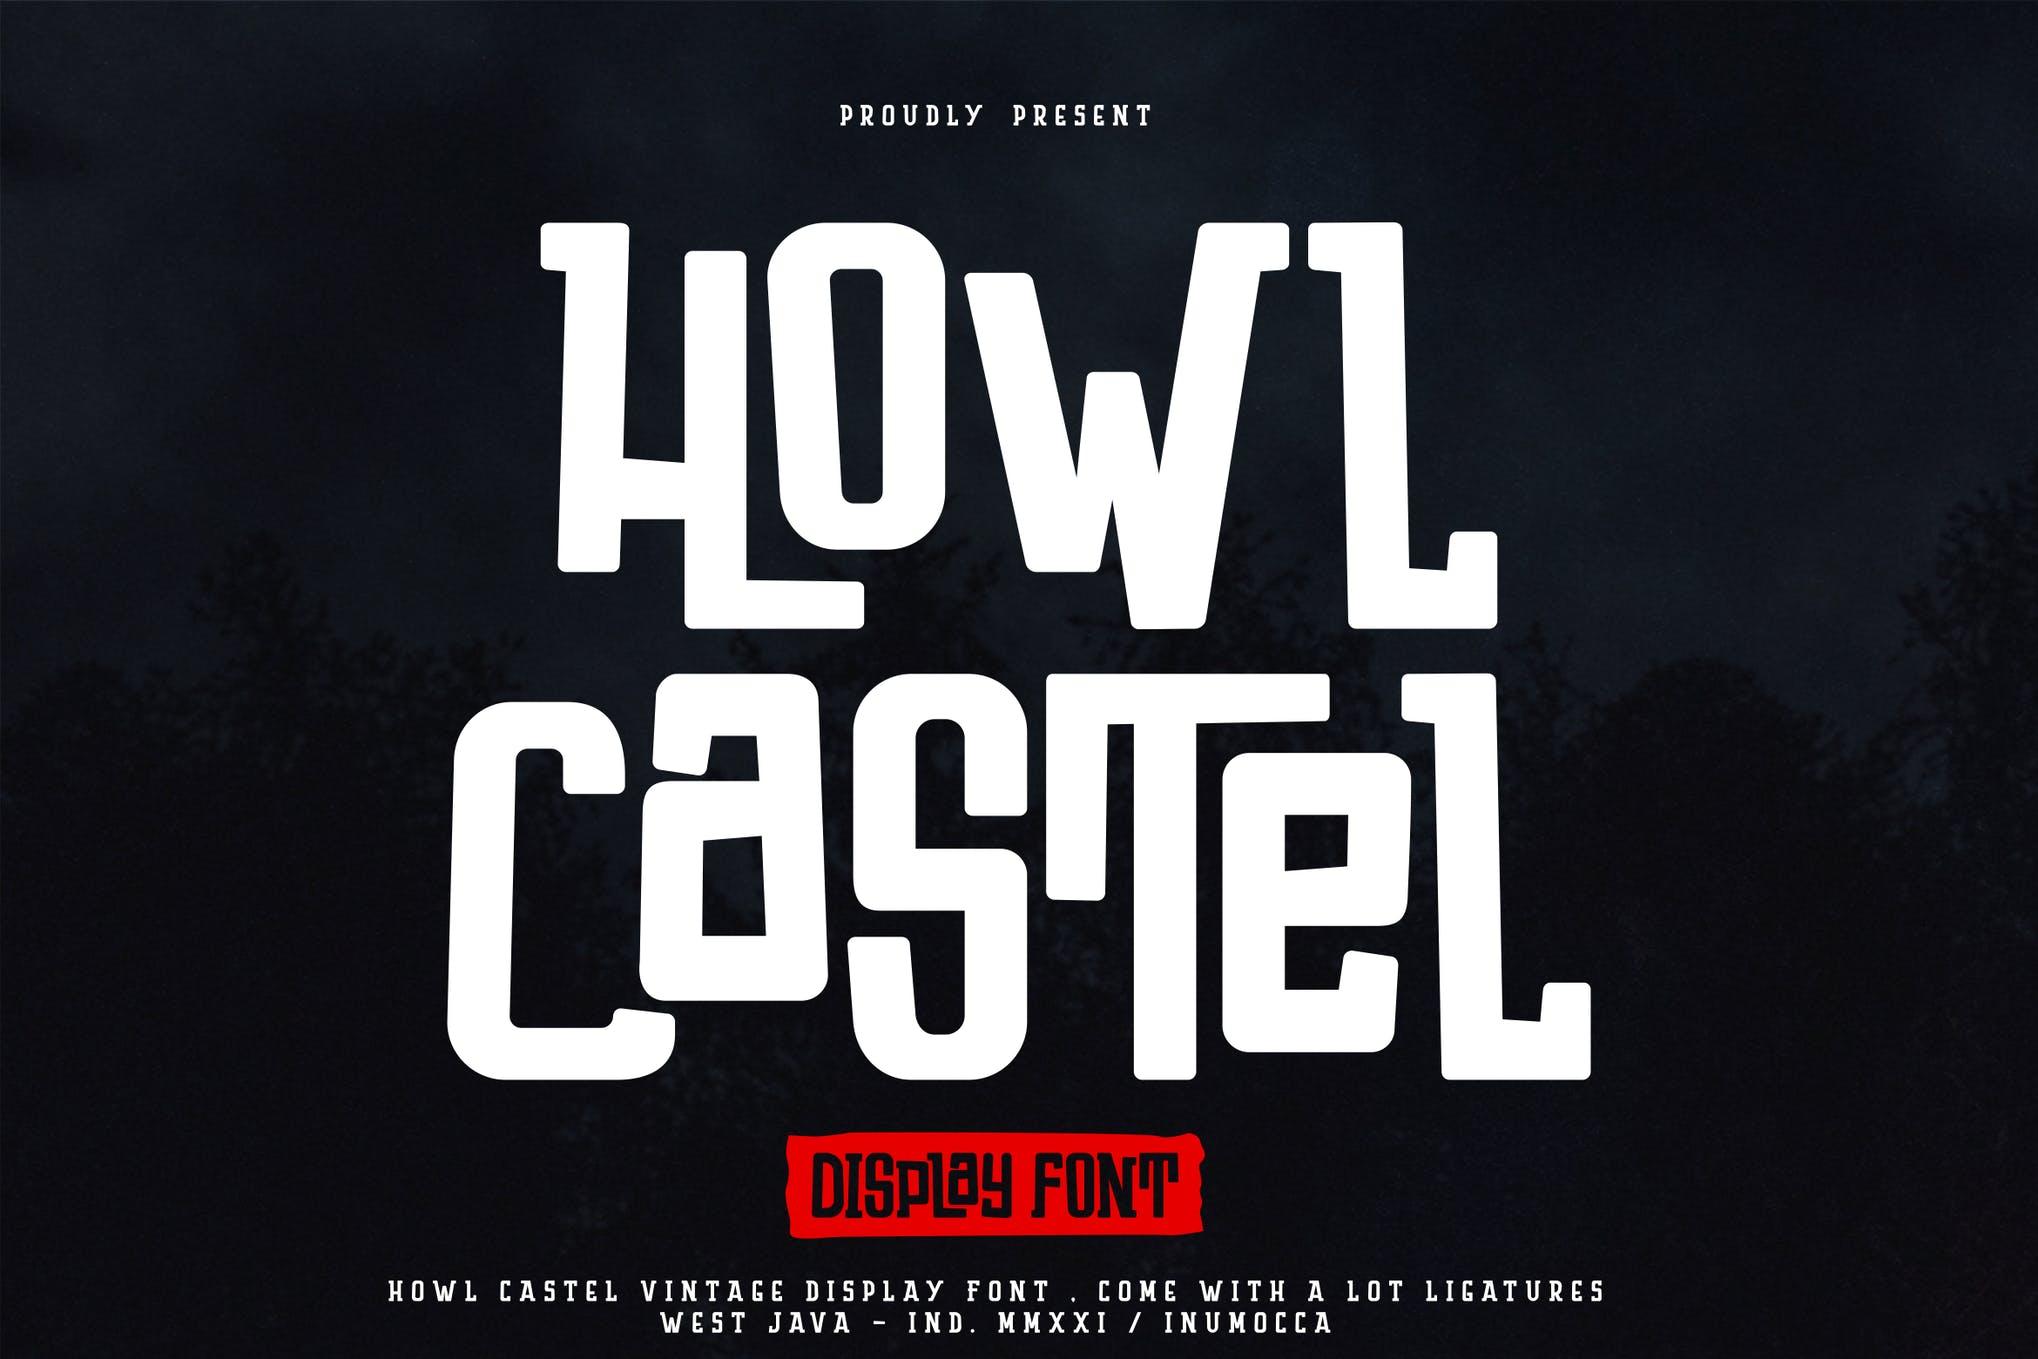 Howl Castel